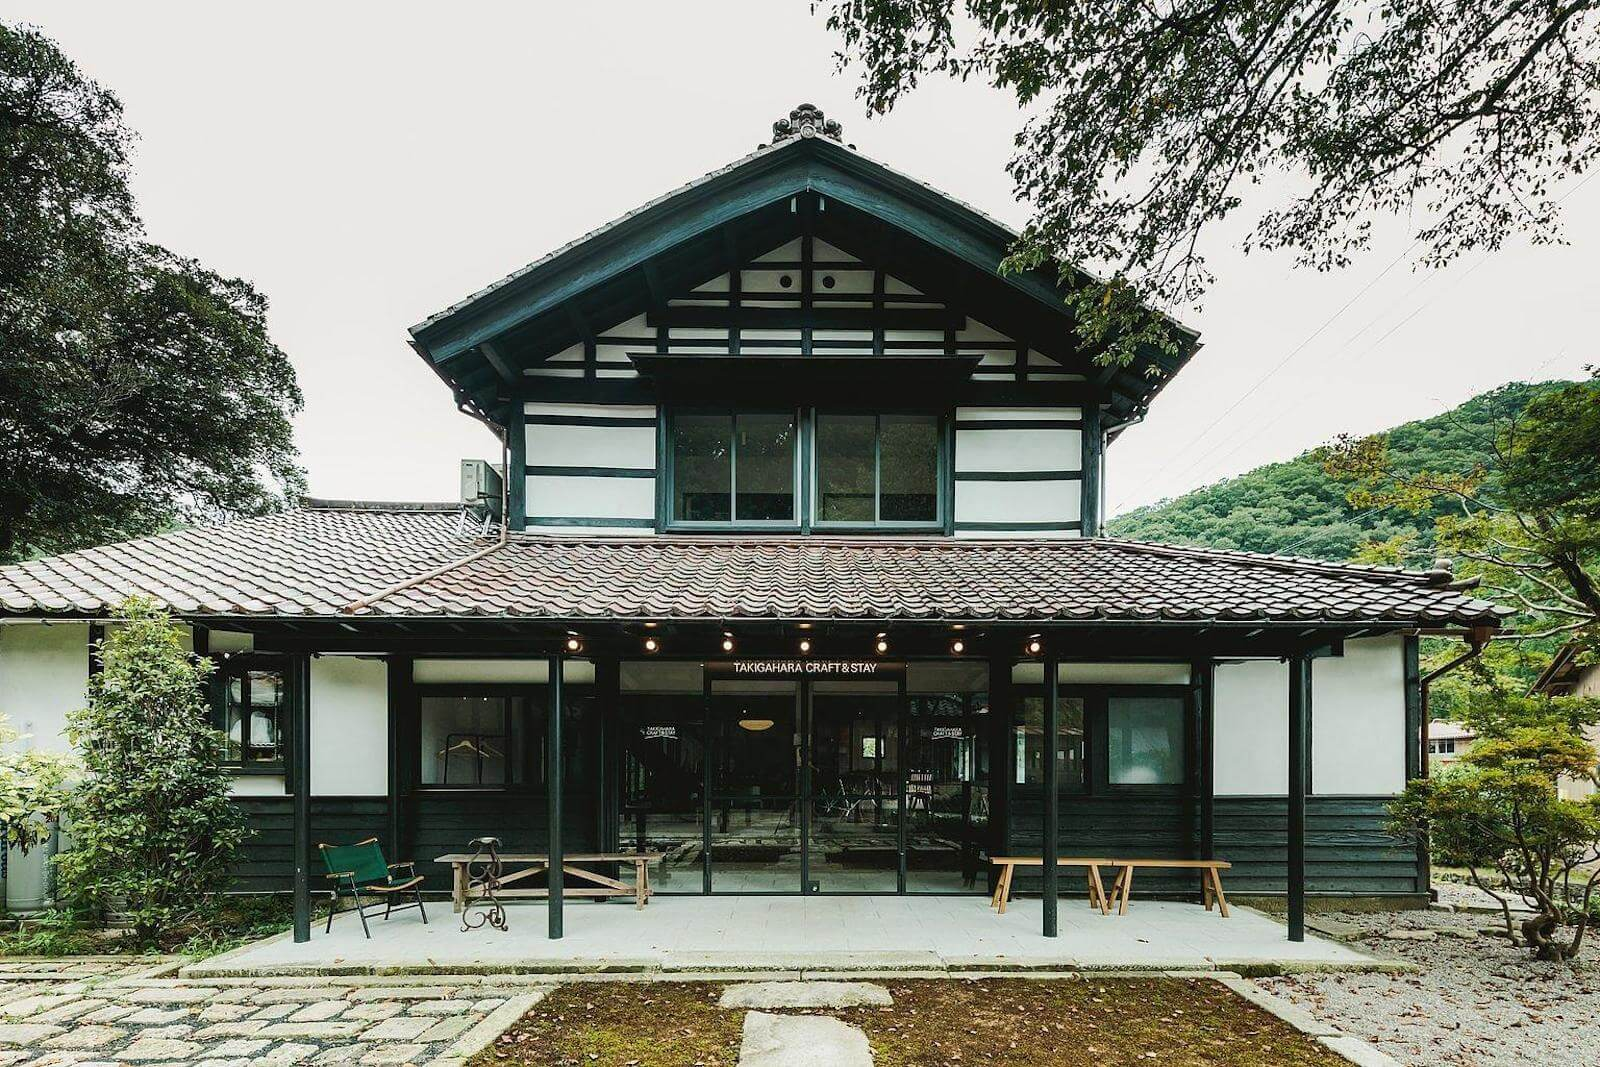 「TAKIGAHARA CRAFT AND STAY」 / 小松市 滝ヶ原町